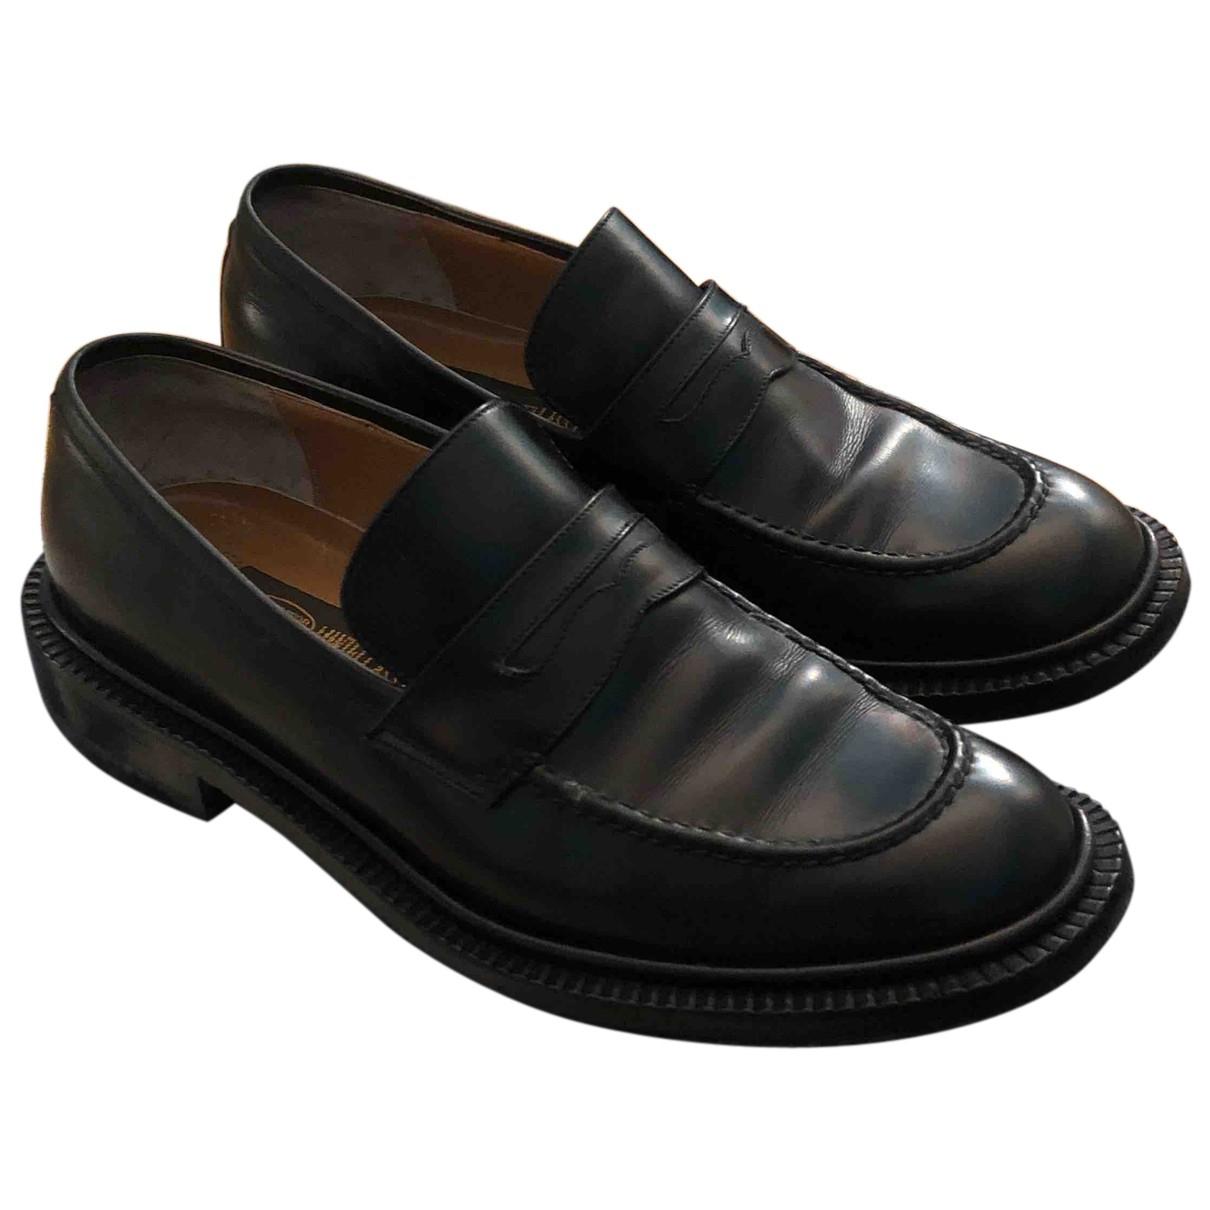 Sutor Mantellassi N Black Leather Flats for Women 35.5 EU